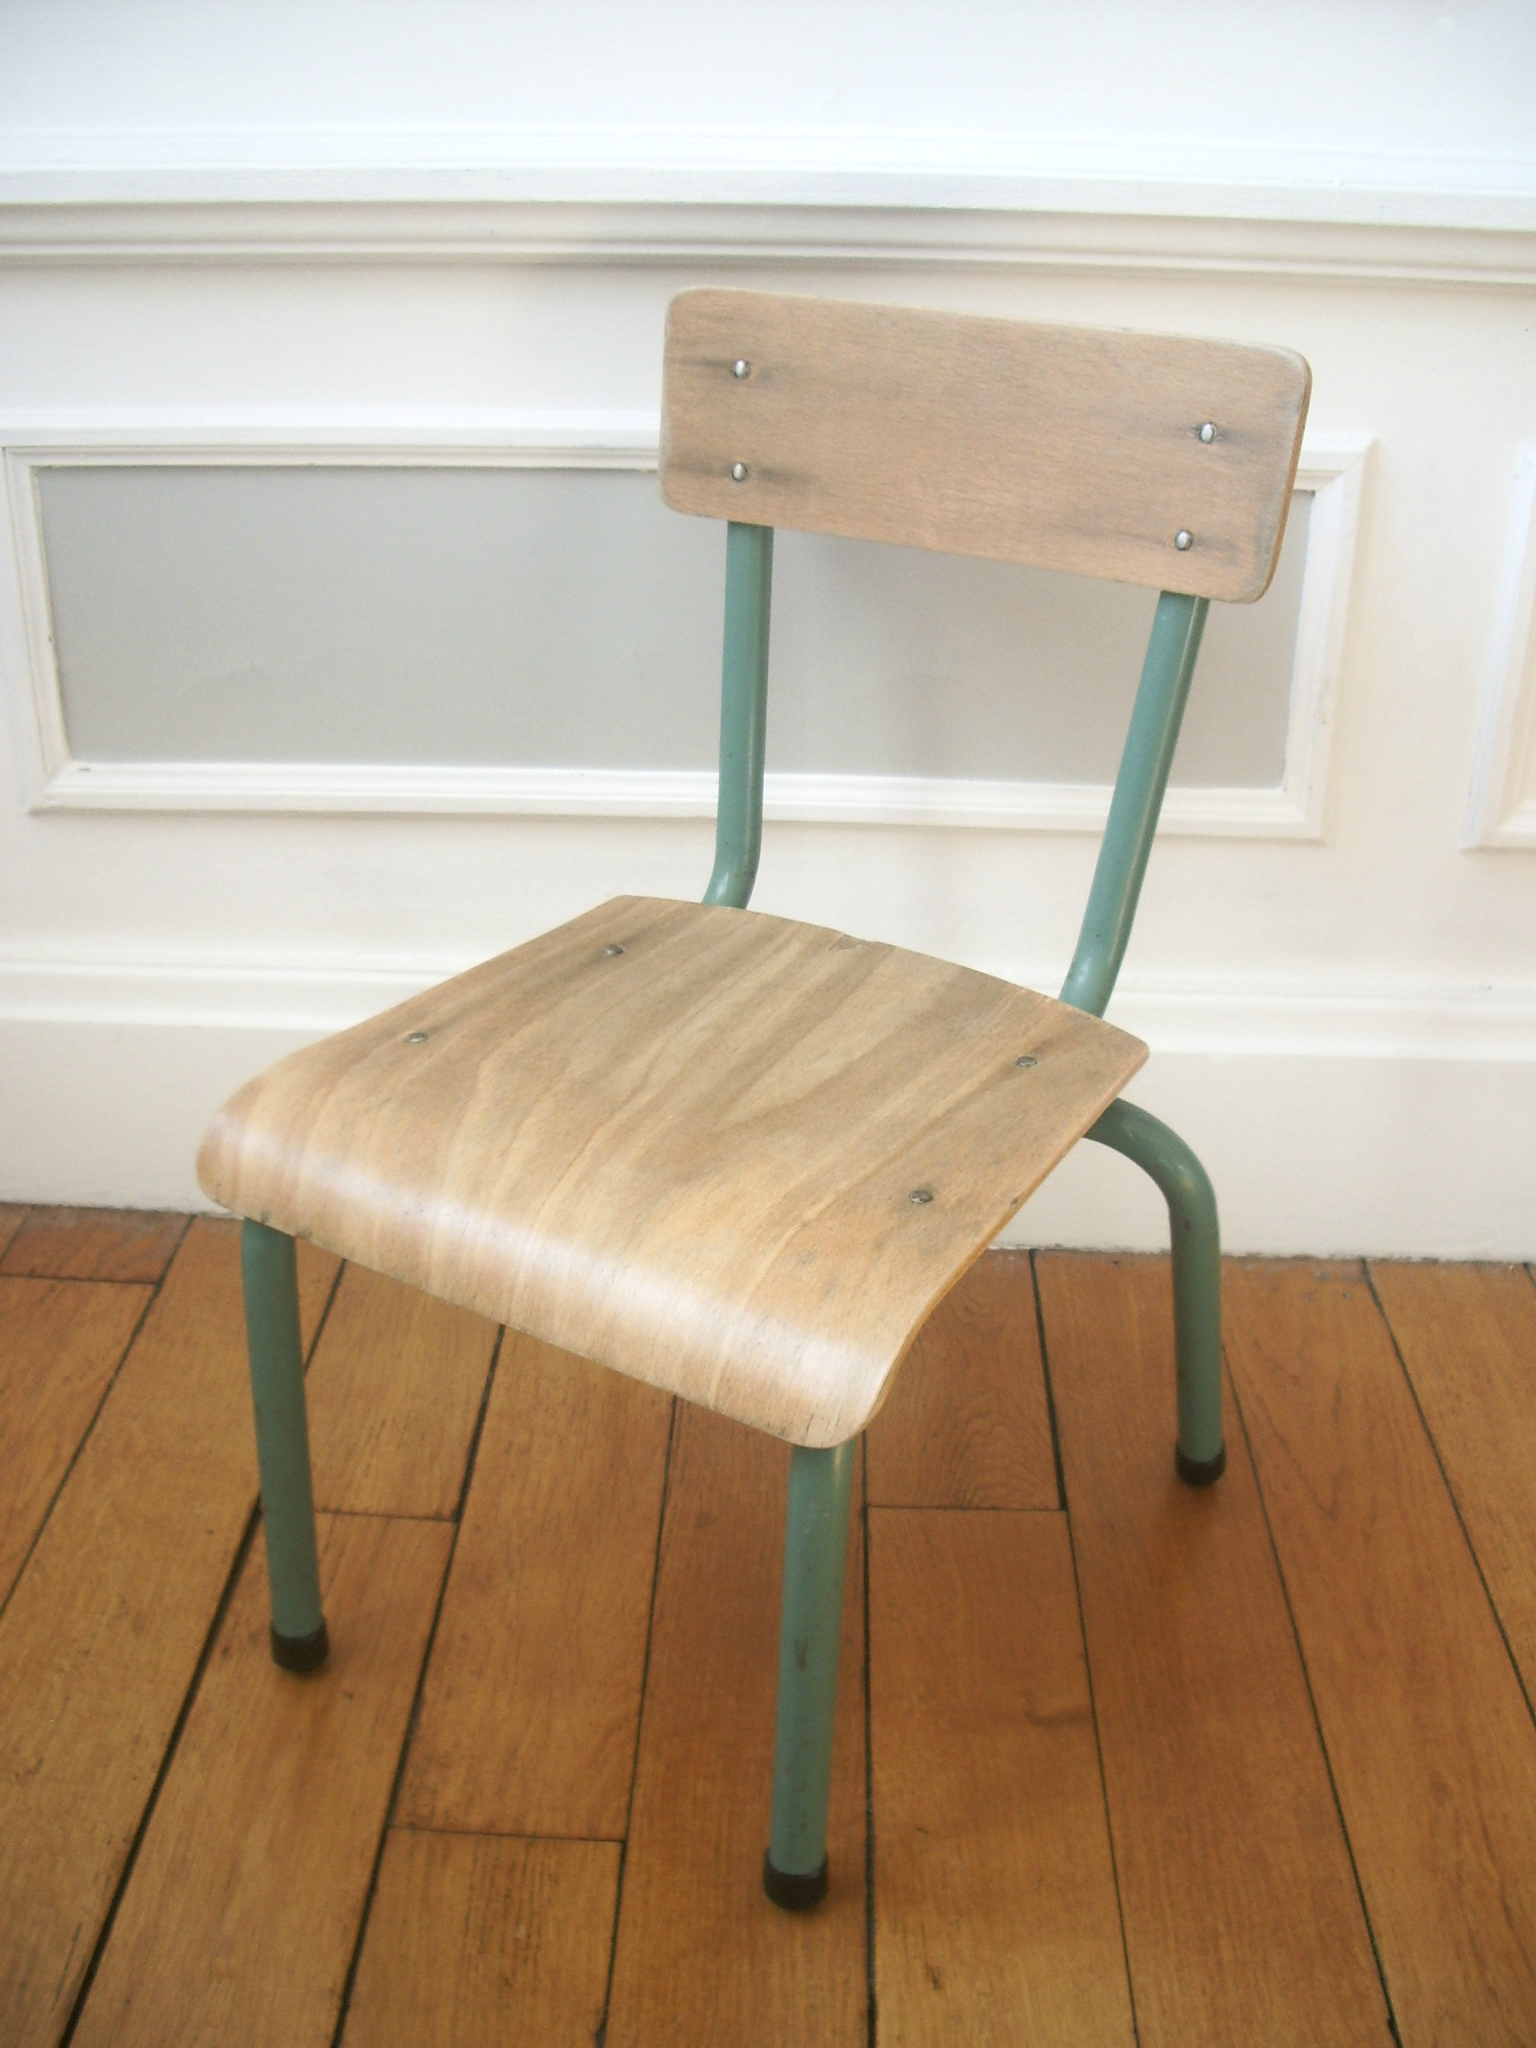 chaise maternelle delagrave urbanbroc for kids. Black Bedroom Furniture Sets. Home Design Ideas